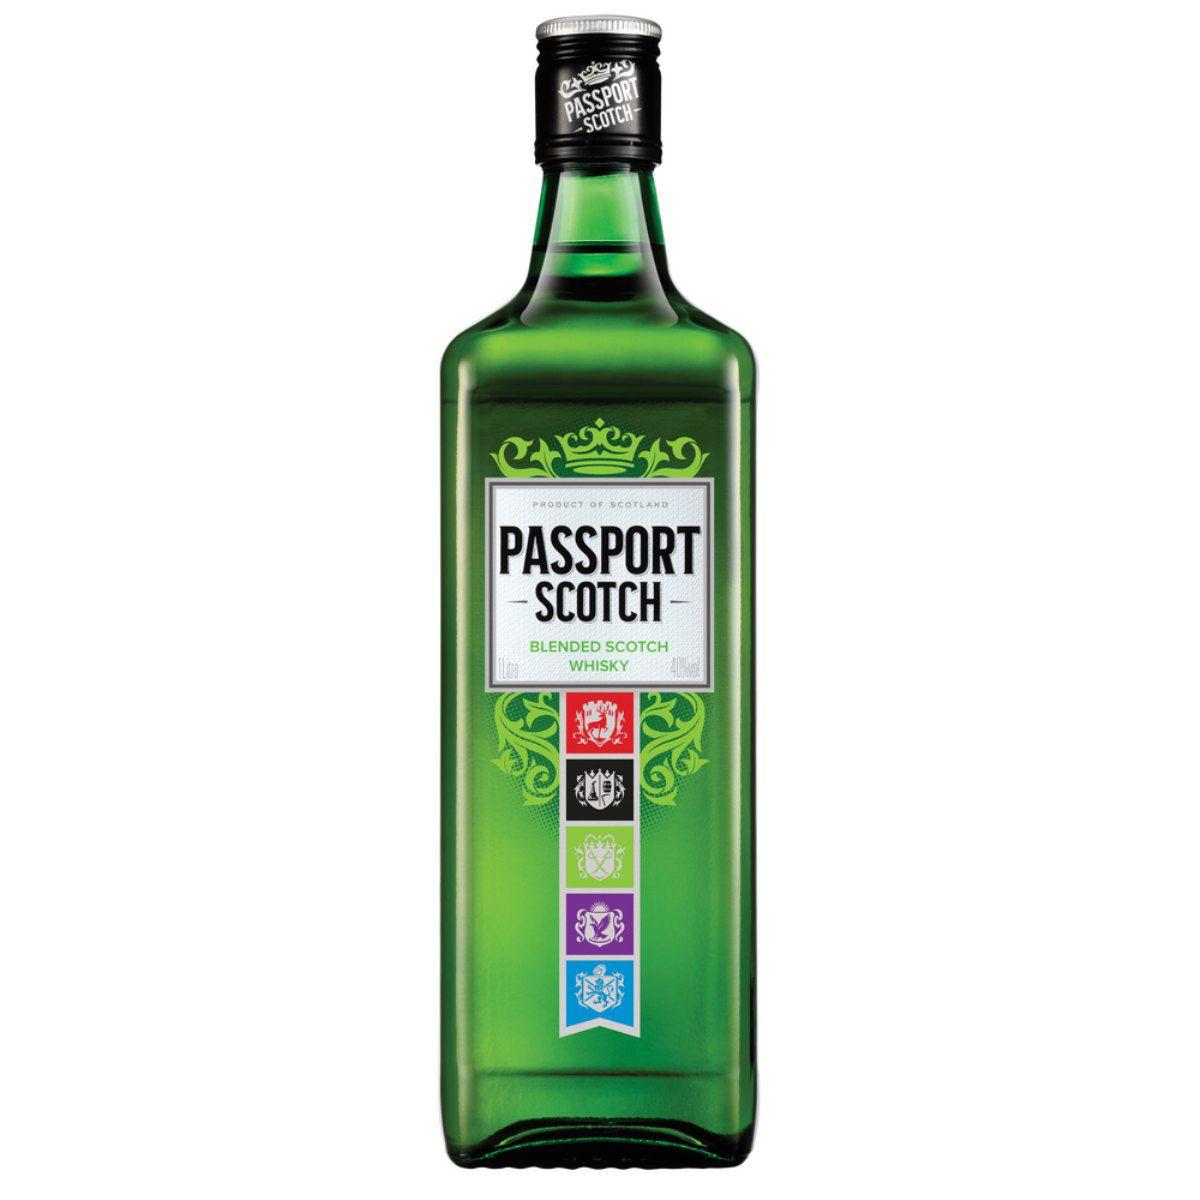 Whisky Passport Scotch 1000 ml